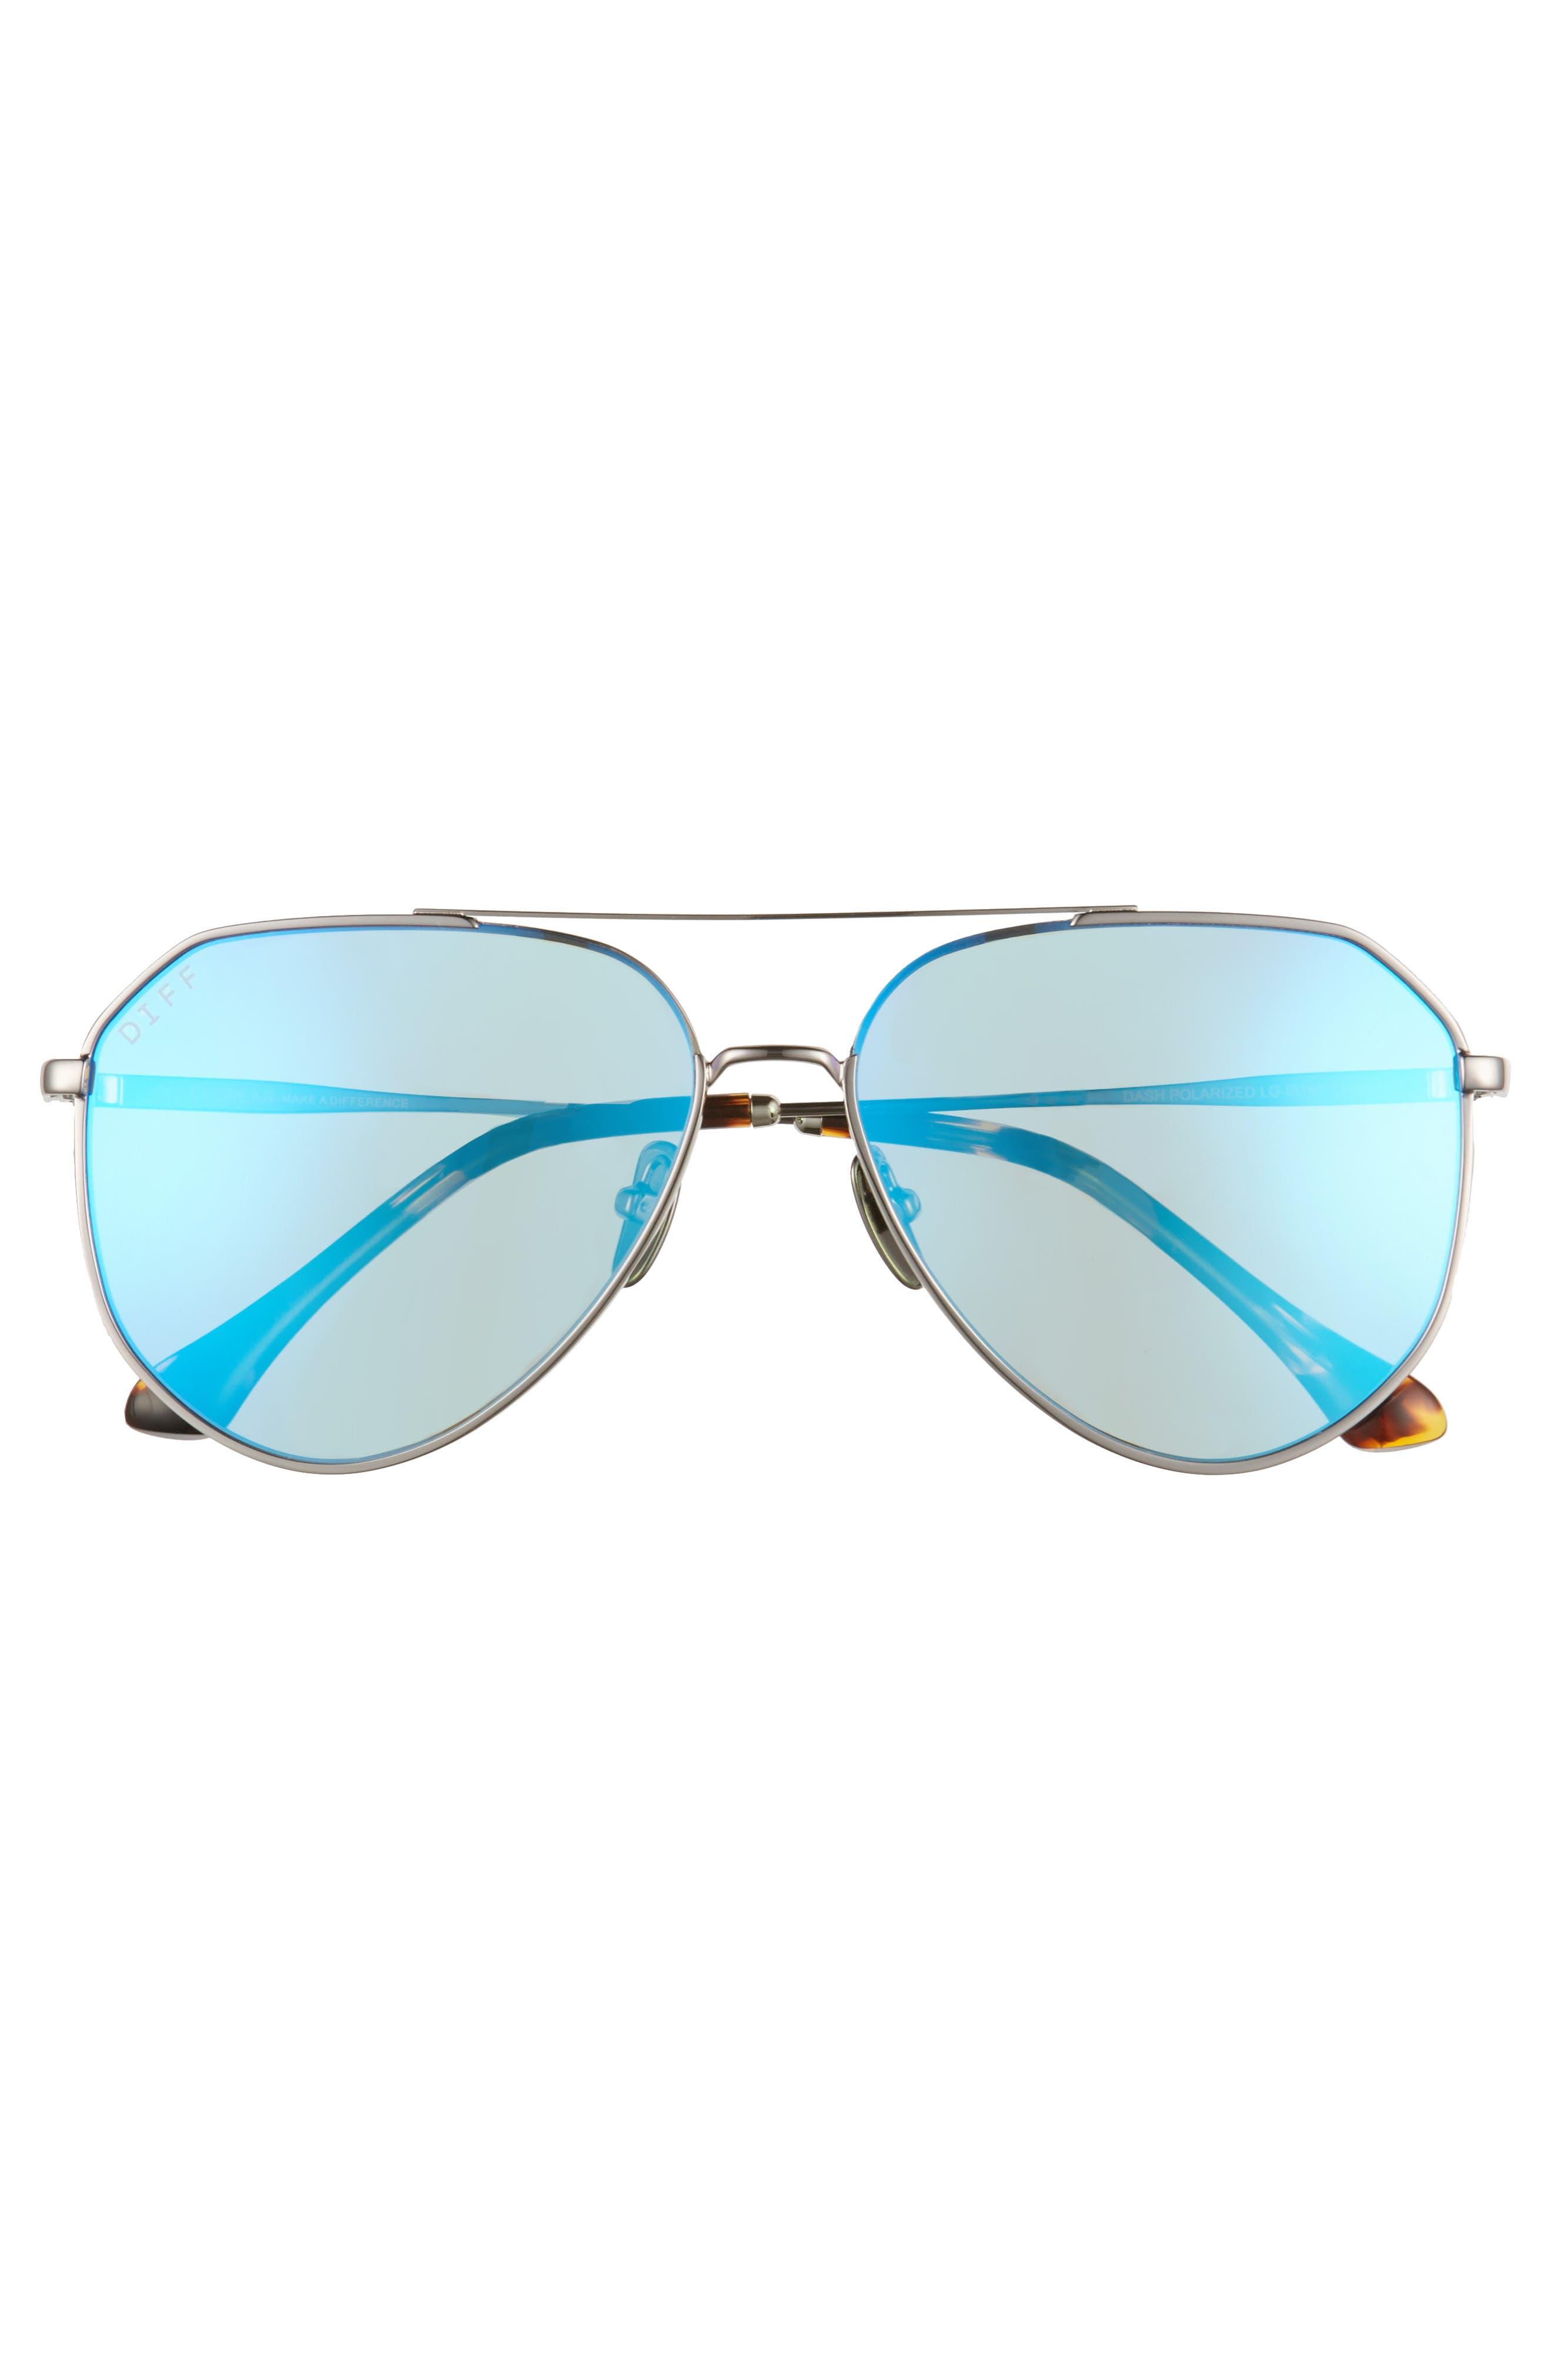 Dash 61mm Polarized Aviator Sunglasses,                             Alternate thumbnail 4, color,                             Gunmetal/ Ice Blue